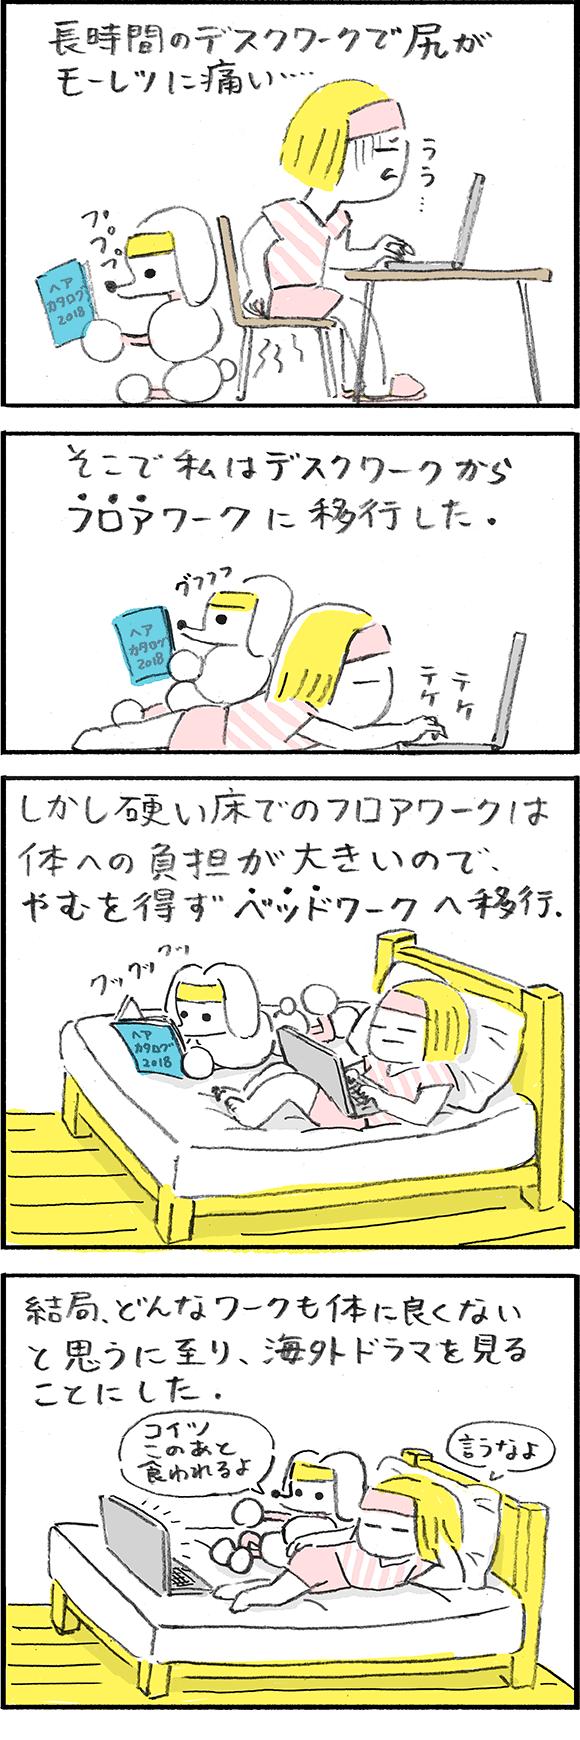 mon_20180521_img1